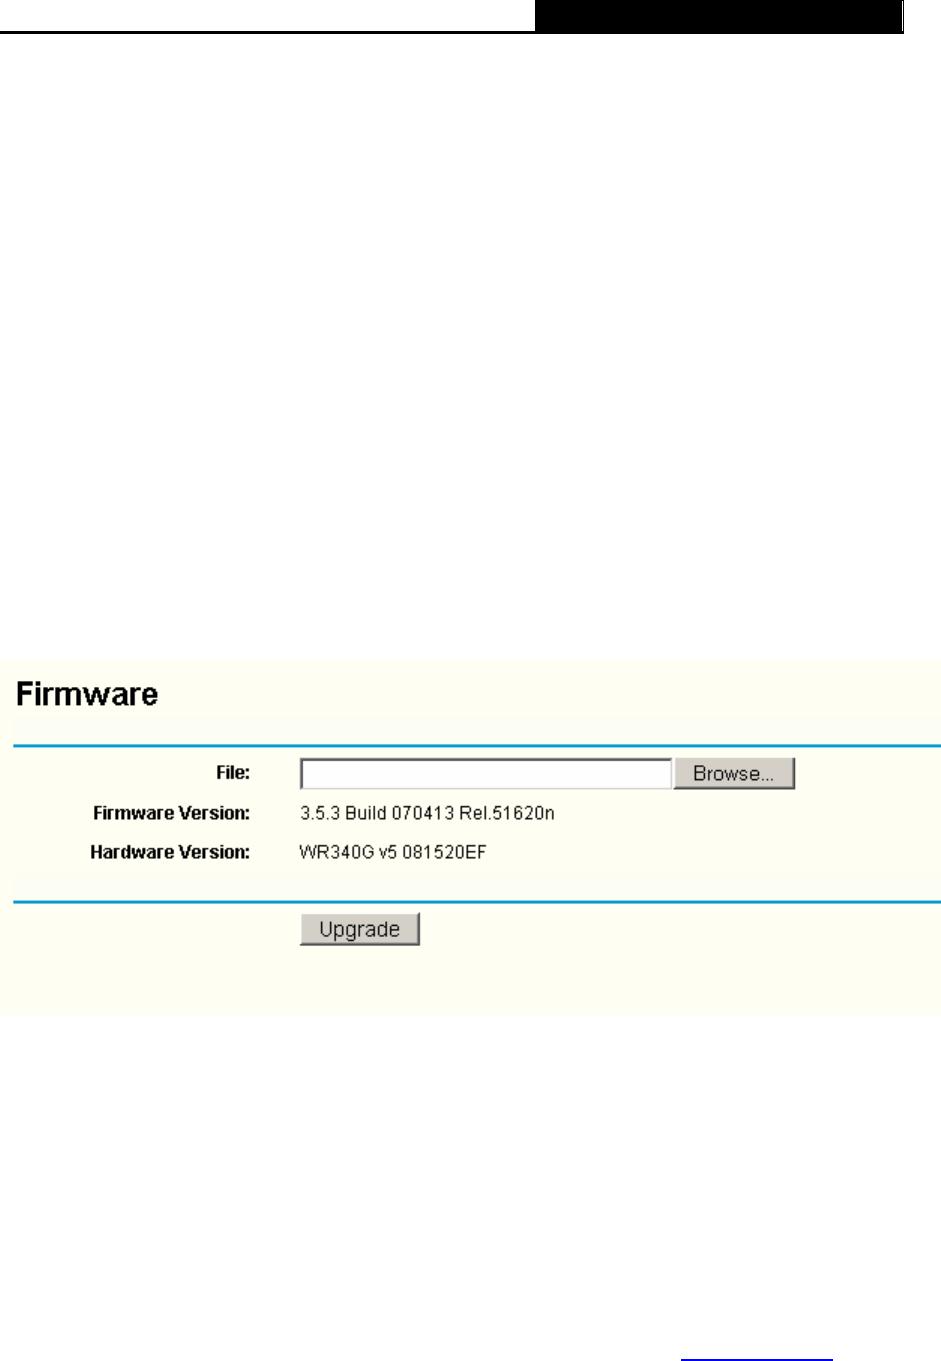 TP-Link TL-WR340G, TL-WR340GD 3  Click Save  , 3 12 2 Firmware